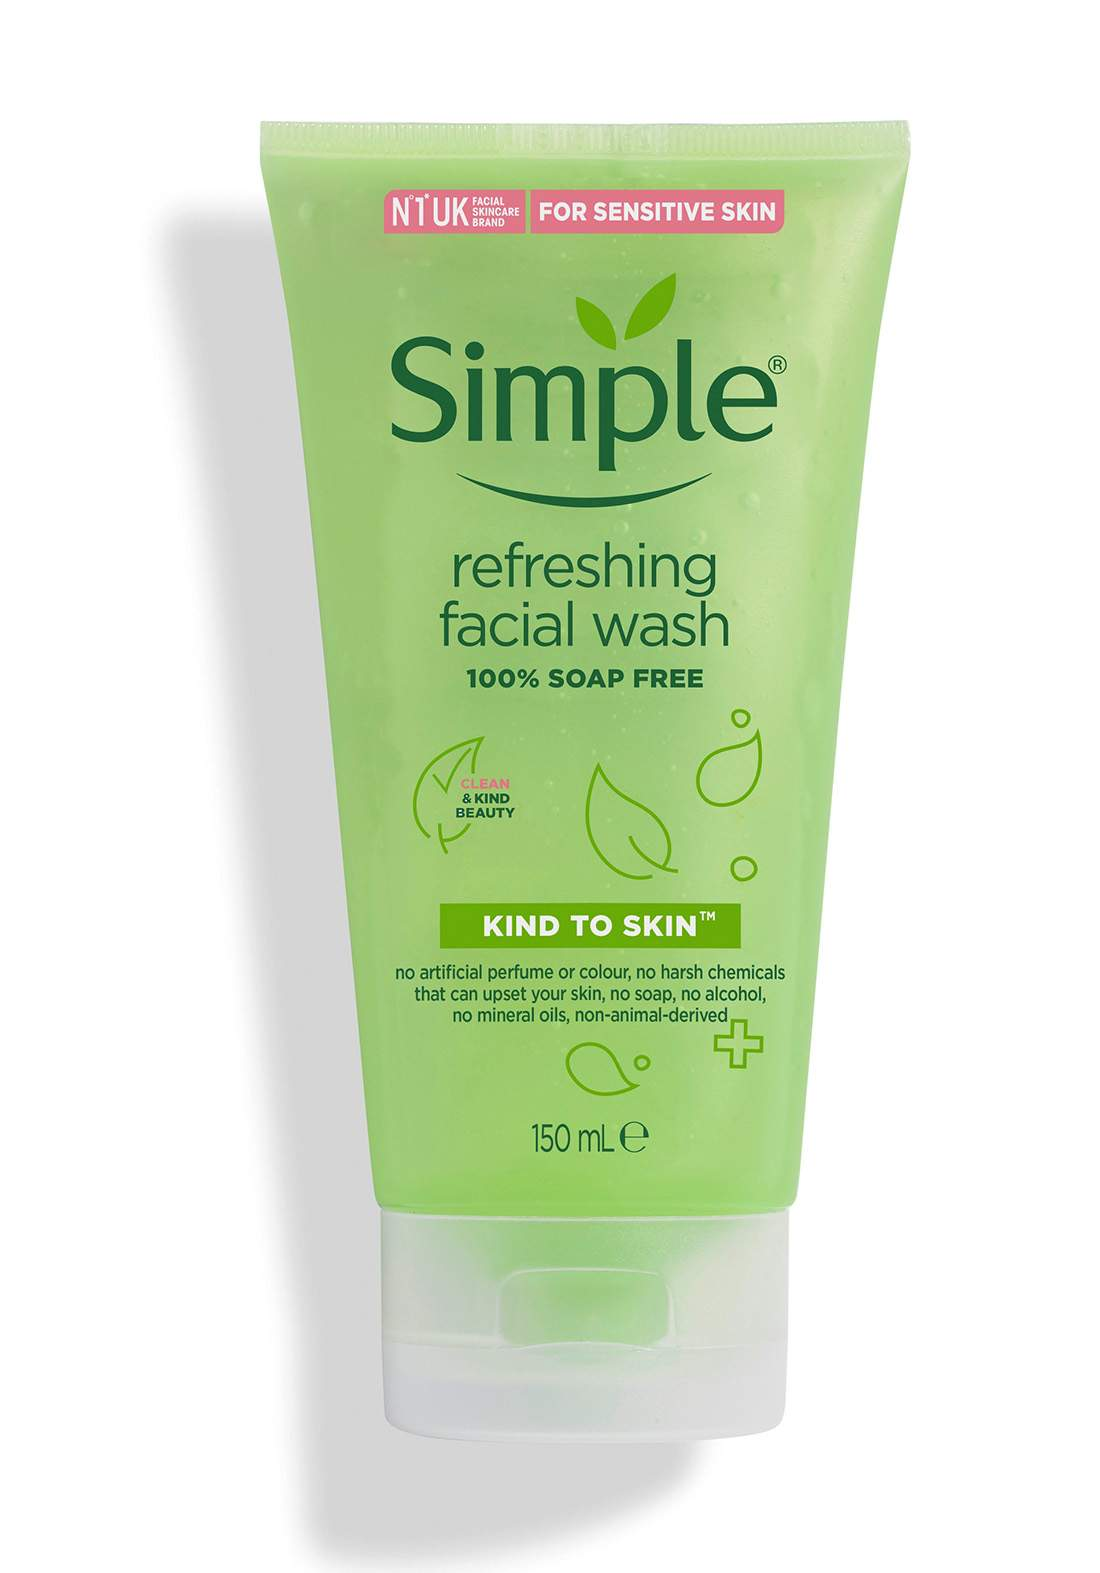 Simple (5311bq) Refreshing Facial Wash Gel For Sensetive Skin 150ml غسول للوجه للبشرة الحساسة